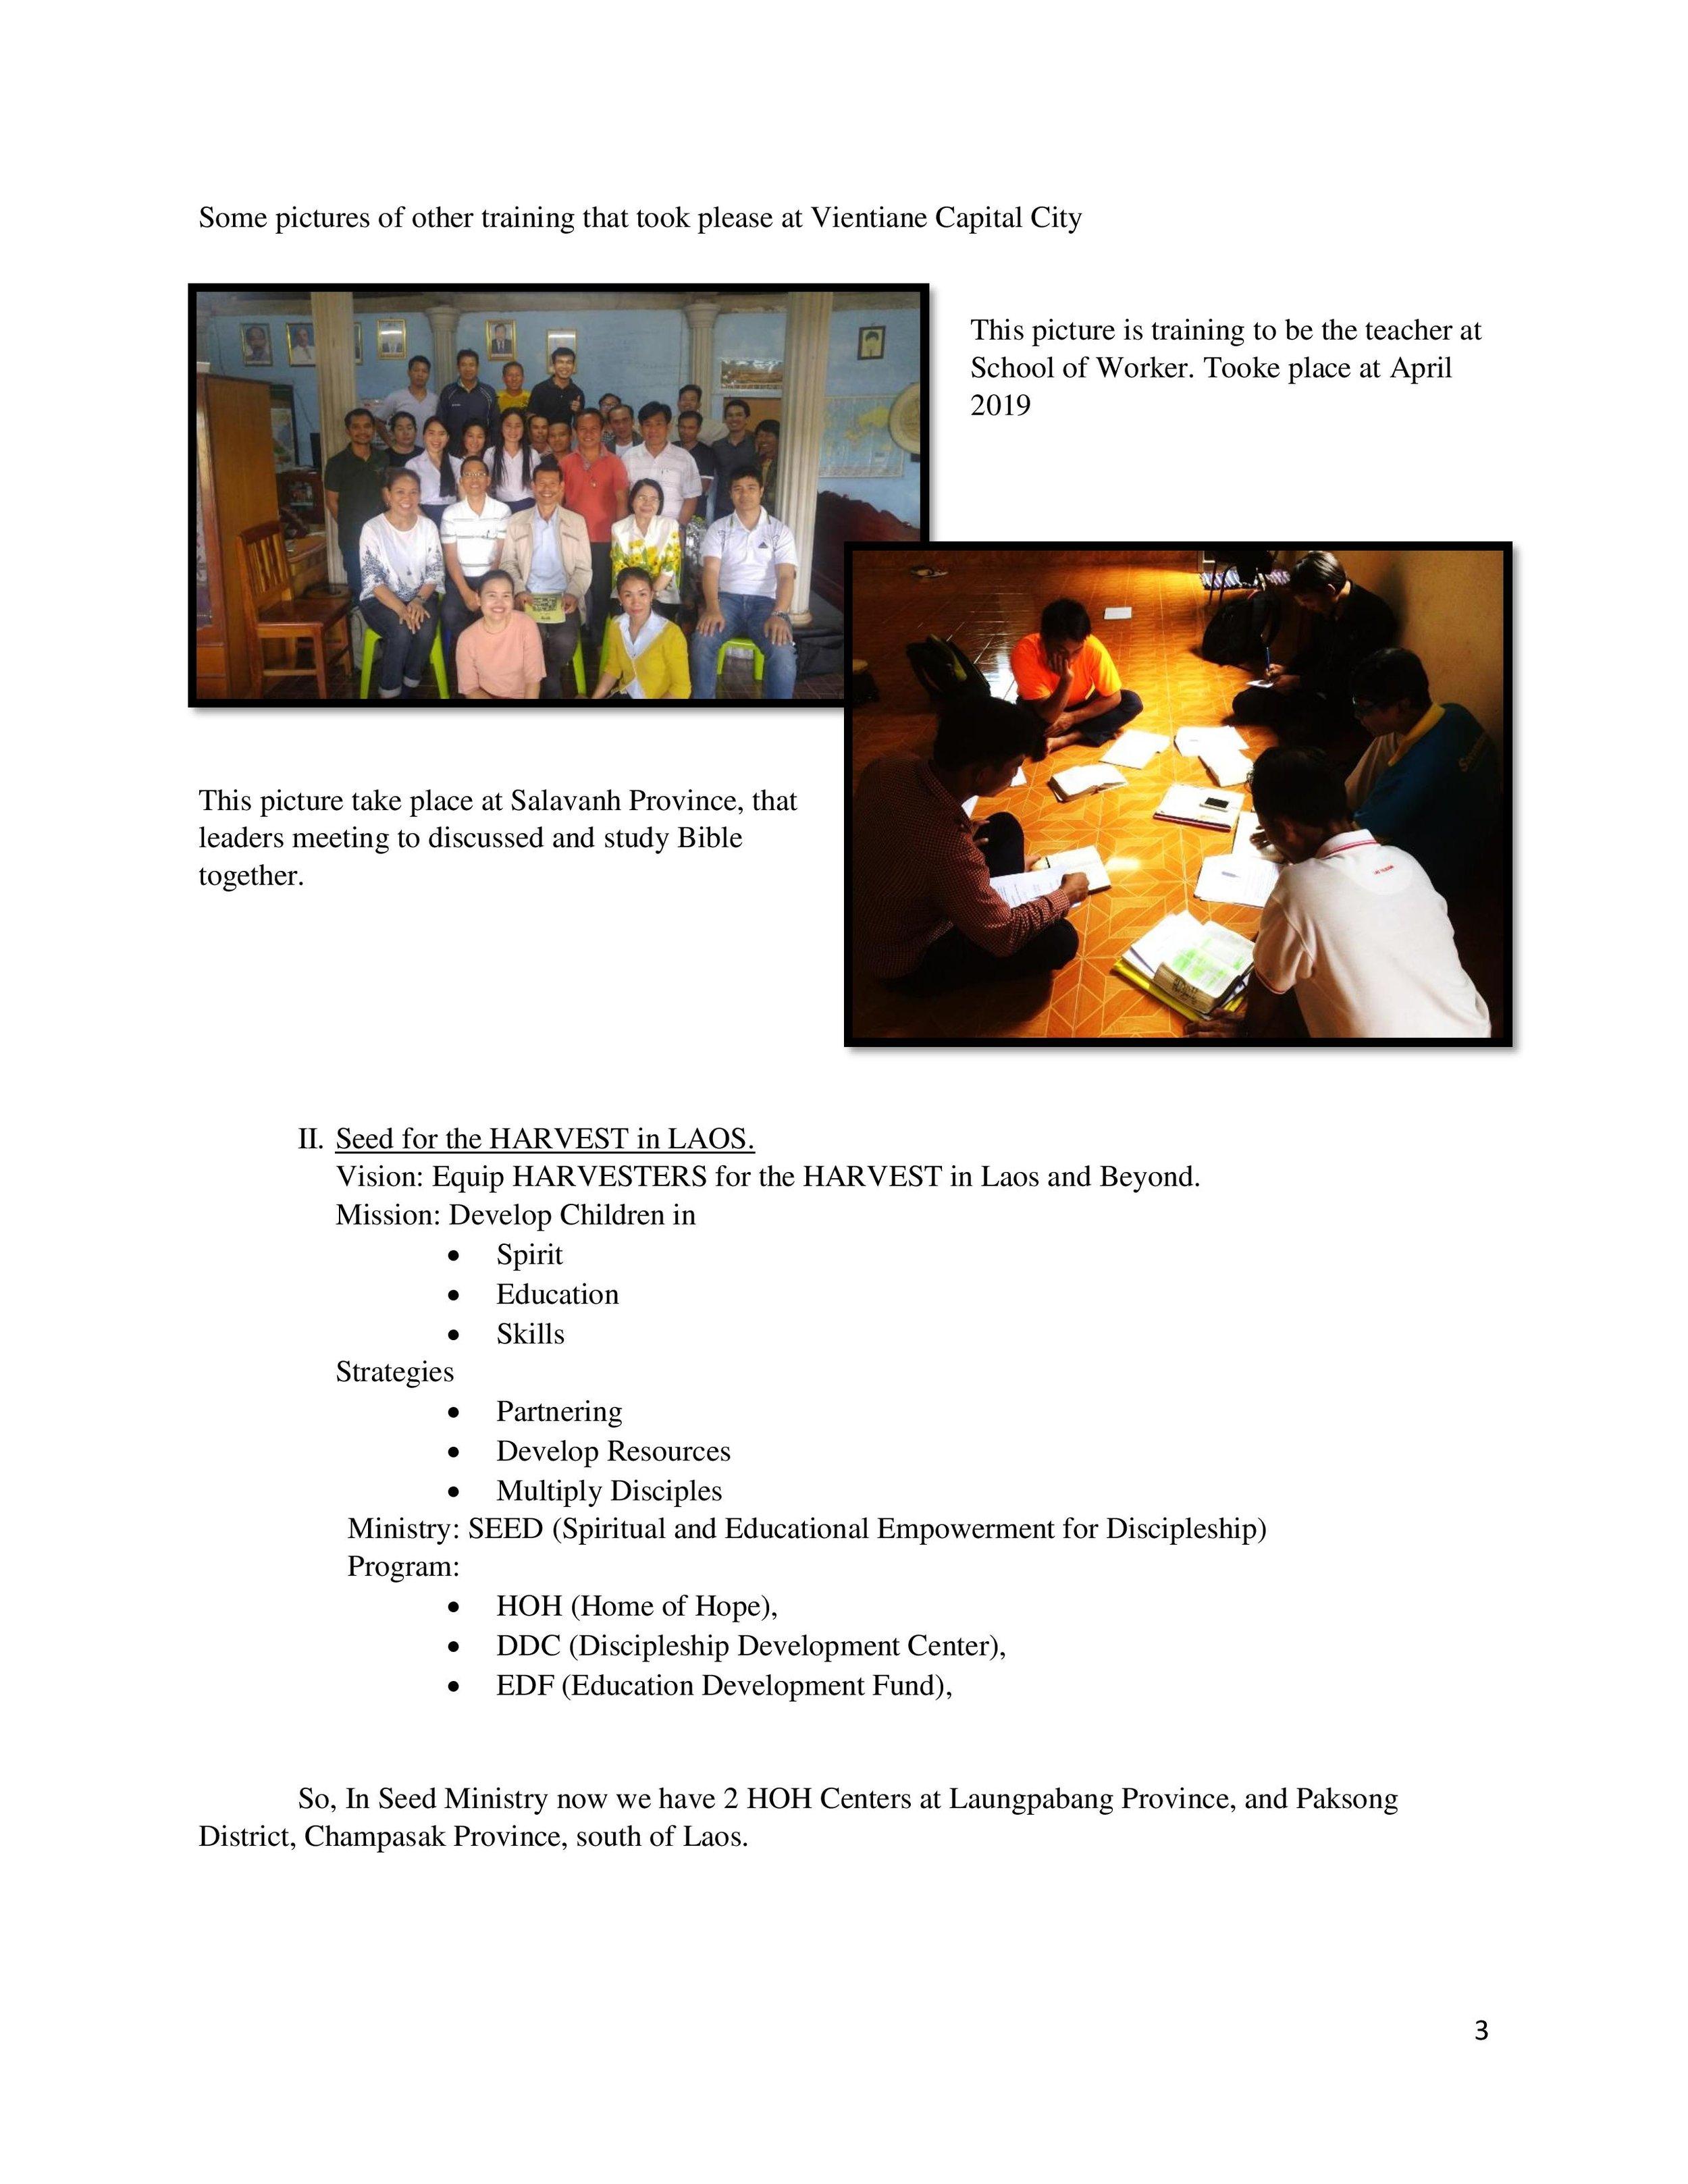 Ministry Update June 2019-page-003.jpg